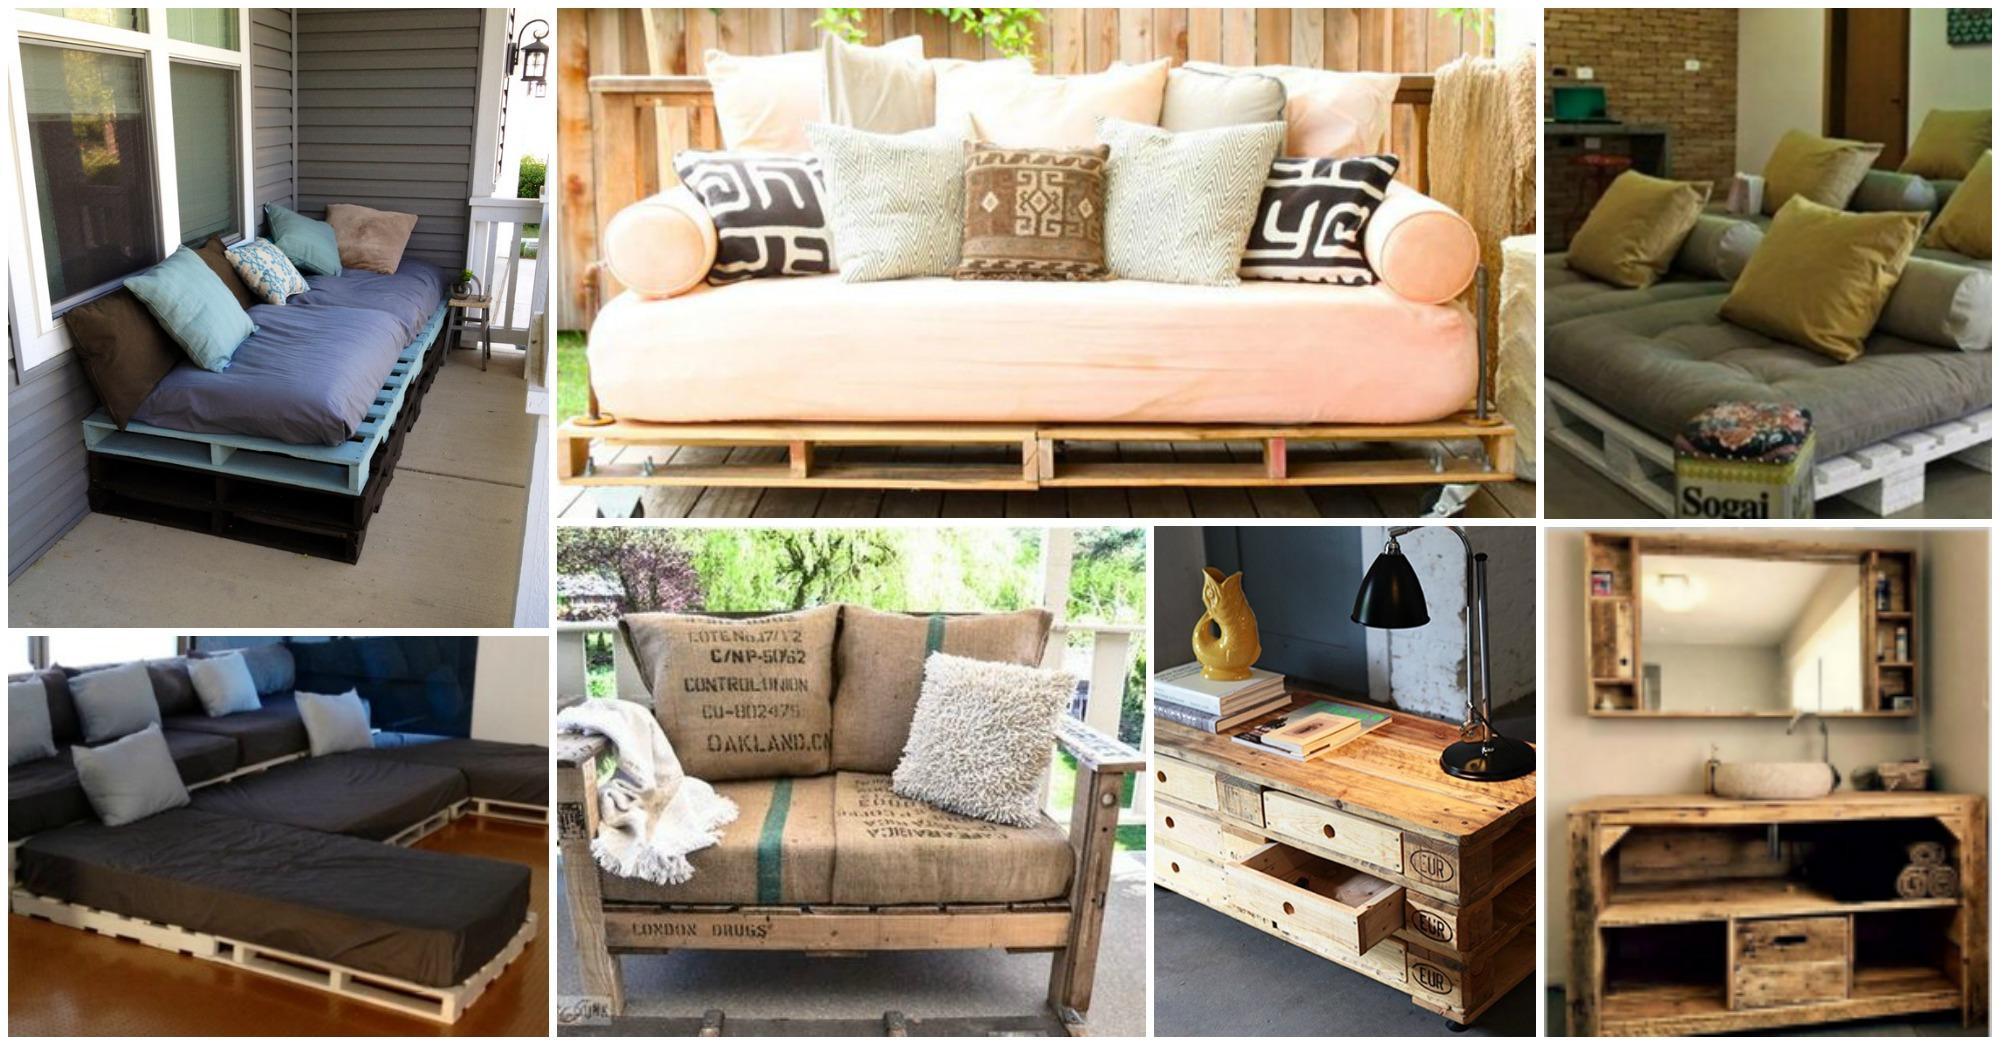 Ideas de muebles hechos con palets latest muebles hechos - Muebles hechos con estibas ...